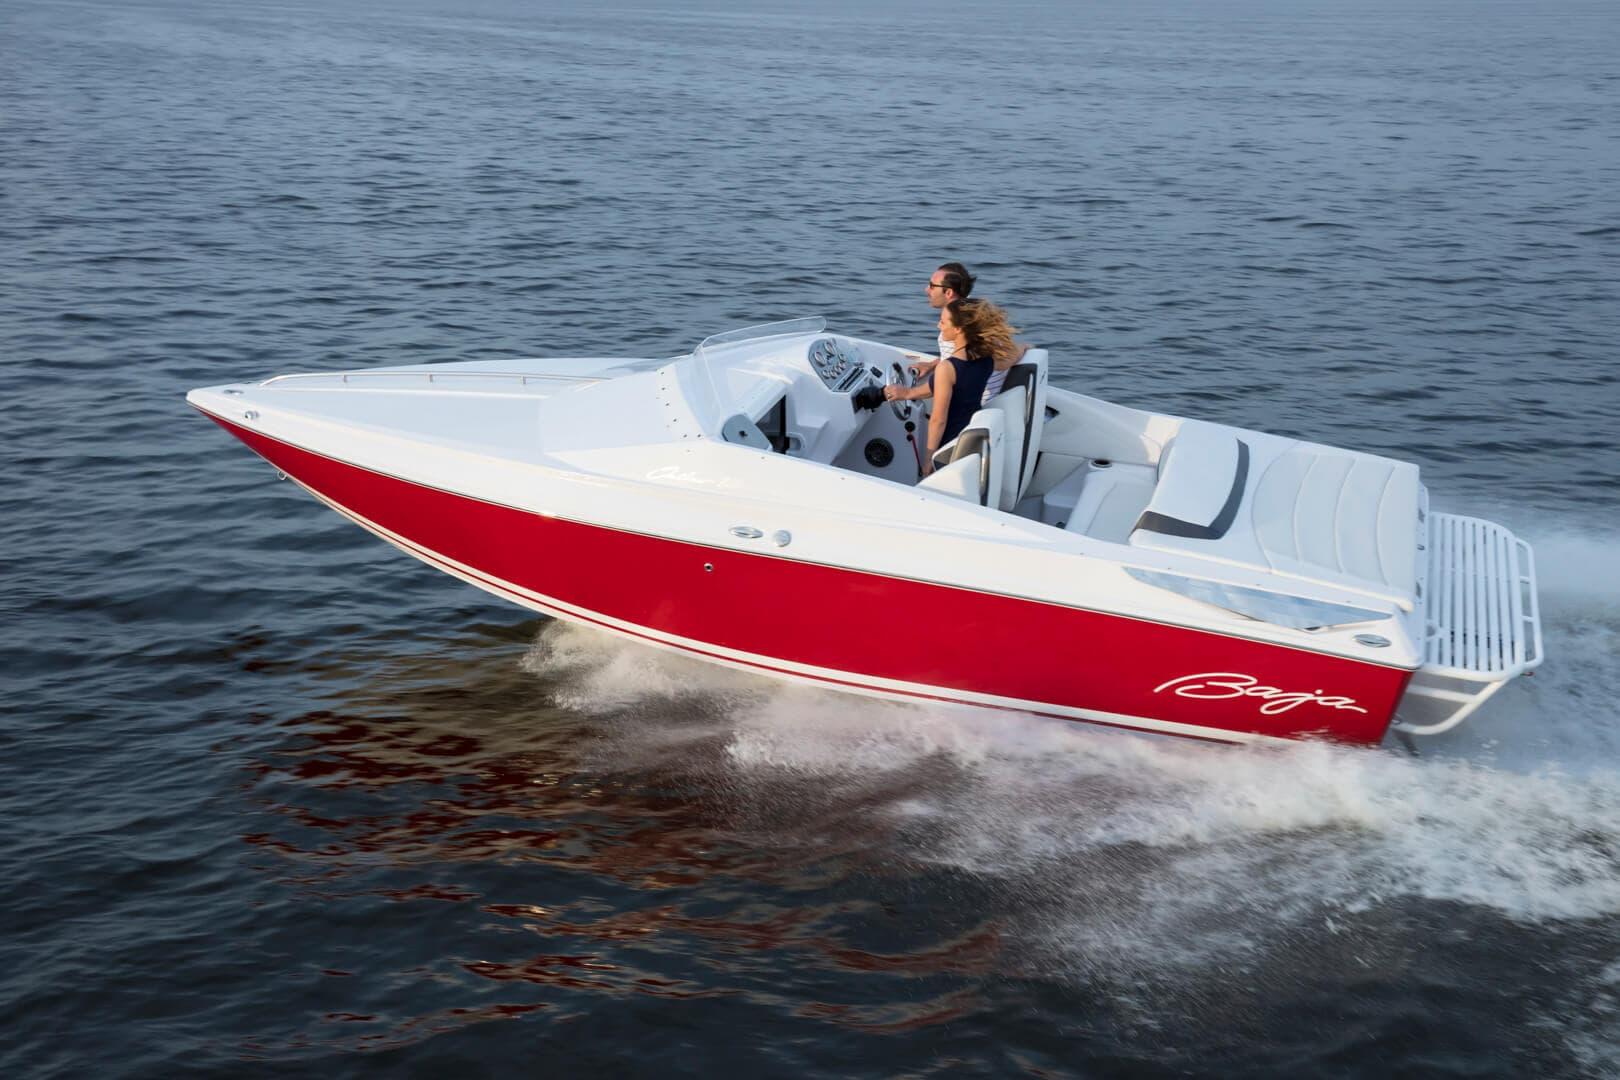 baja marine 23 outlaw 32 of 90 baja marine rh bajamarine com Baja Marine Vintage Donzi Boats